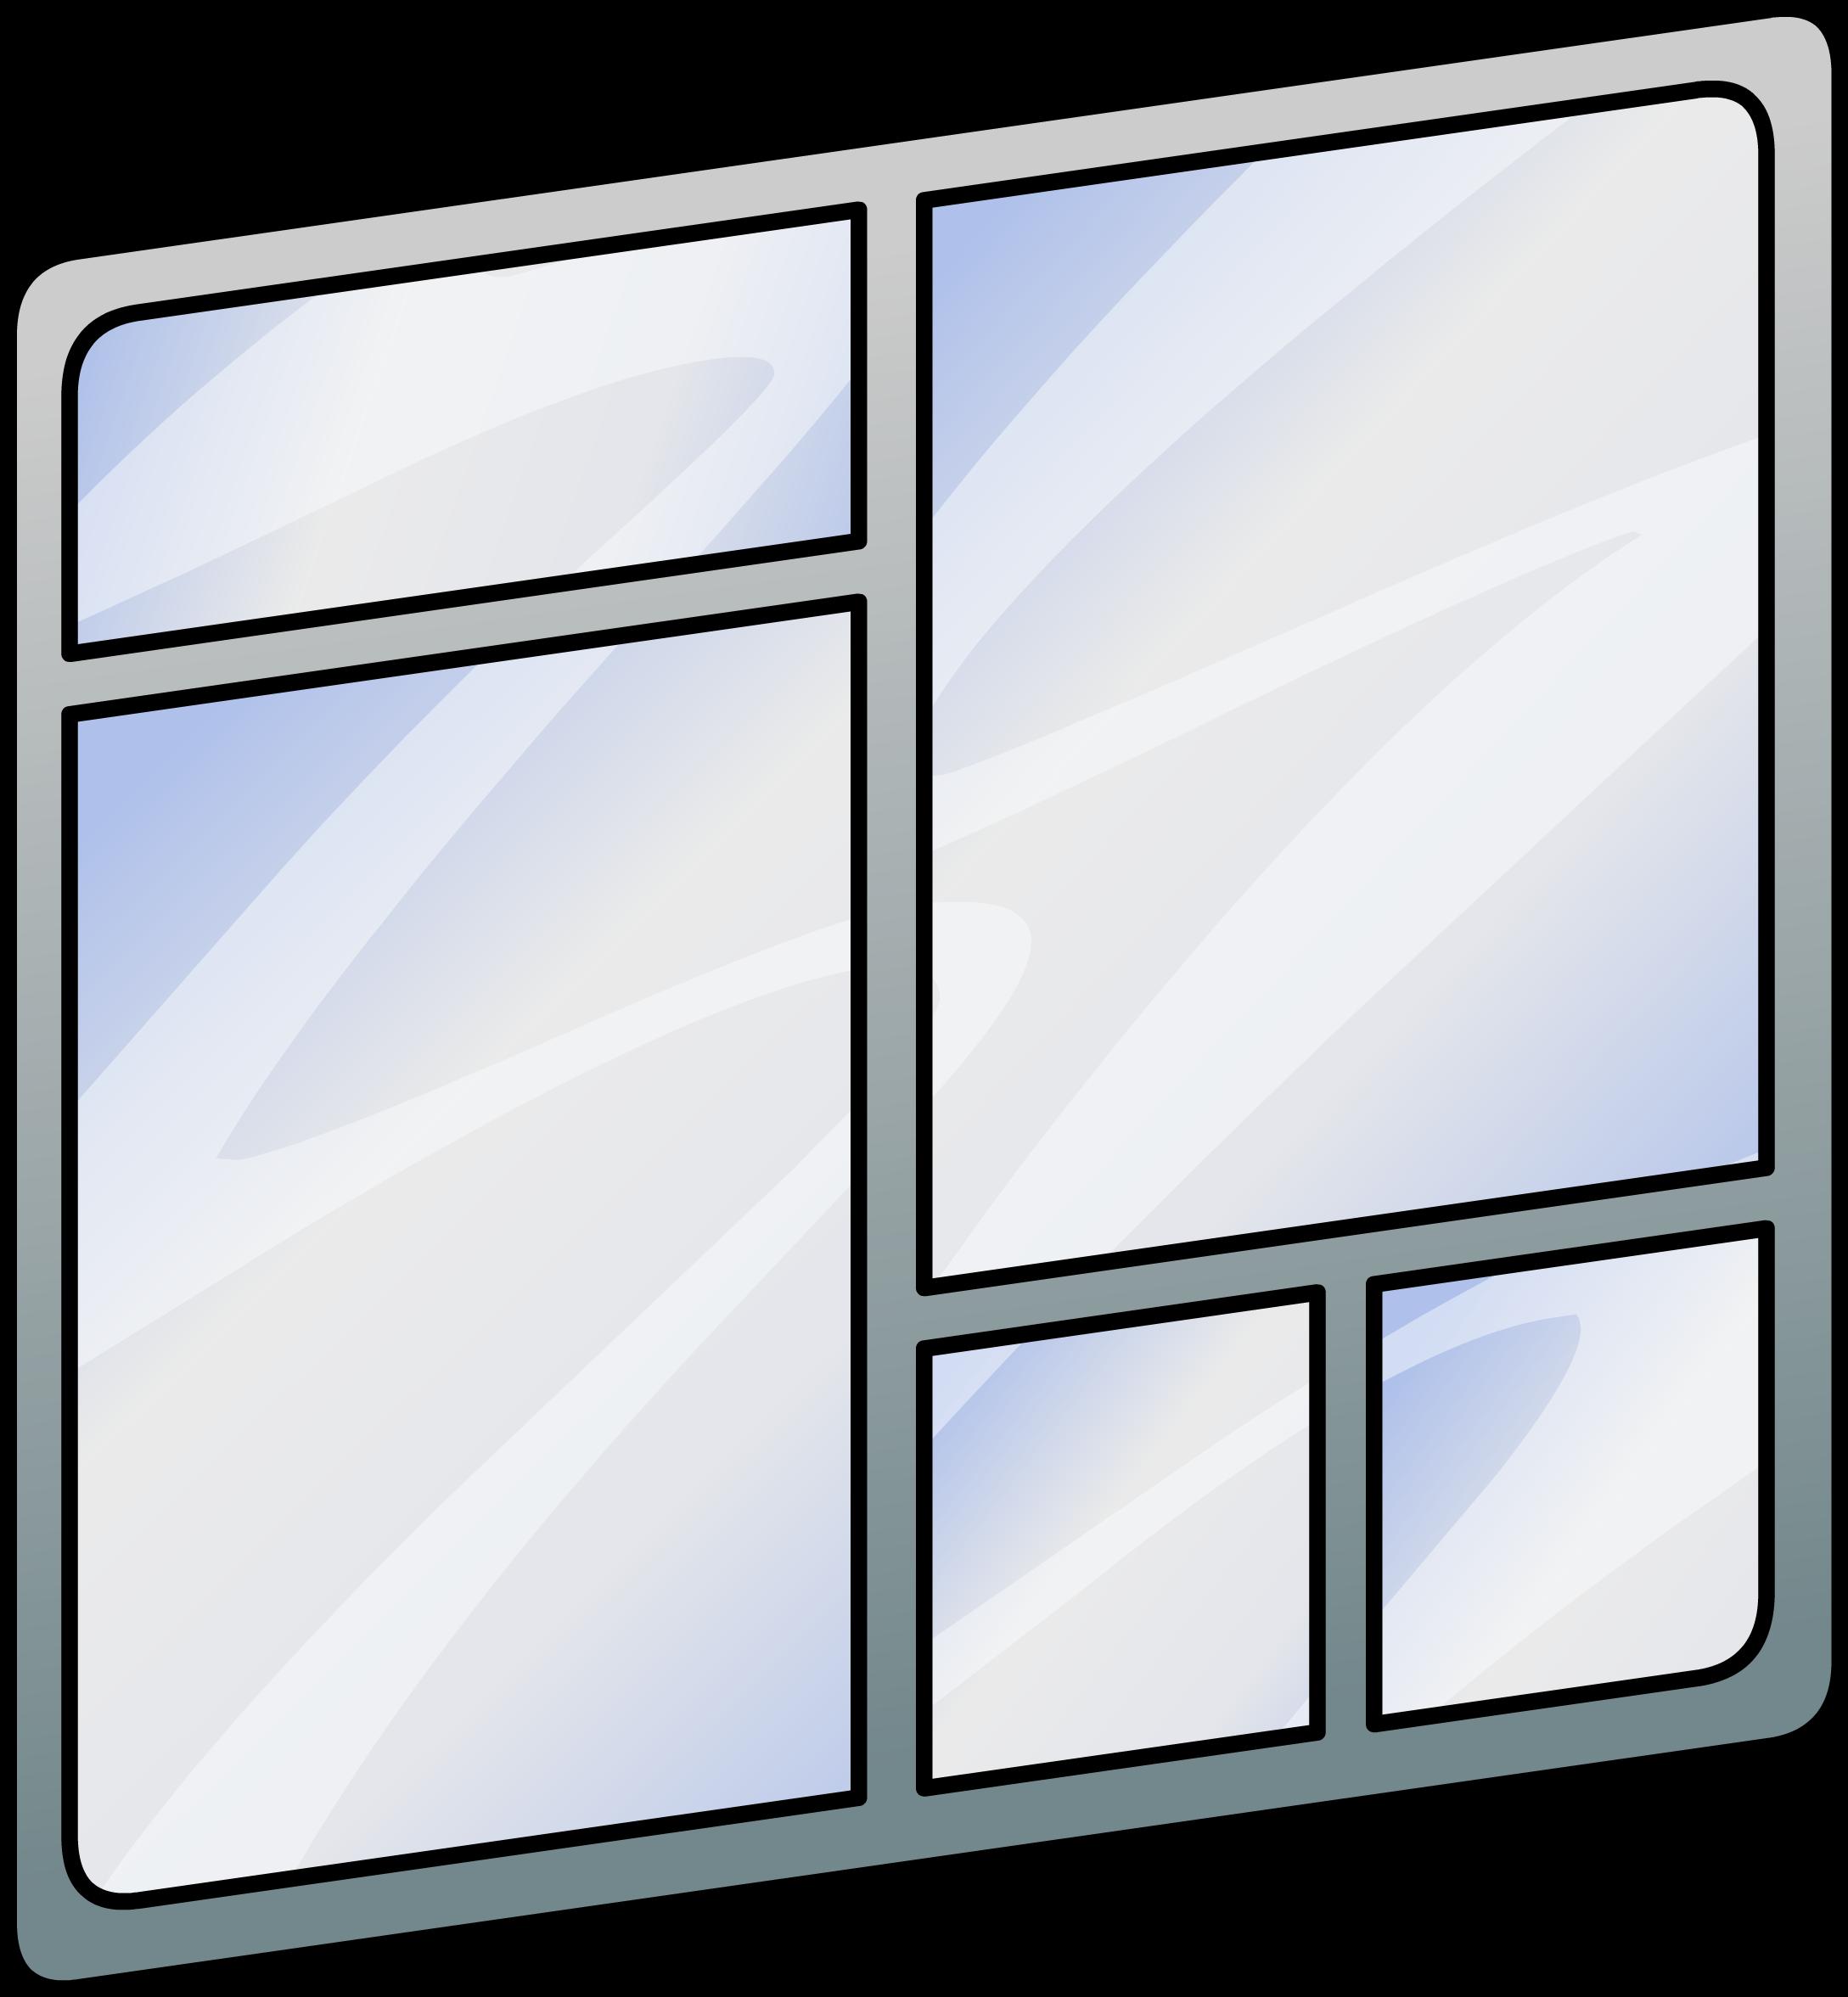 Image sprite png club. Furniture clipart window screen